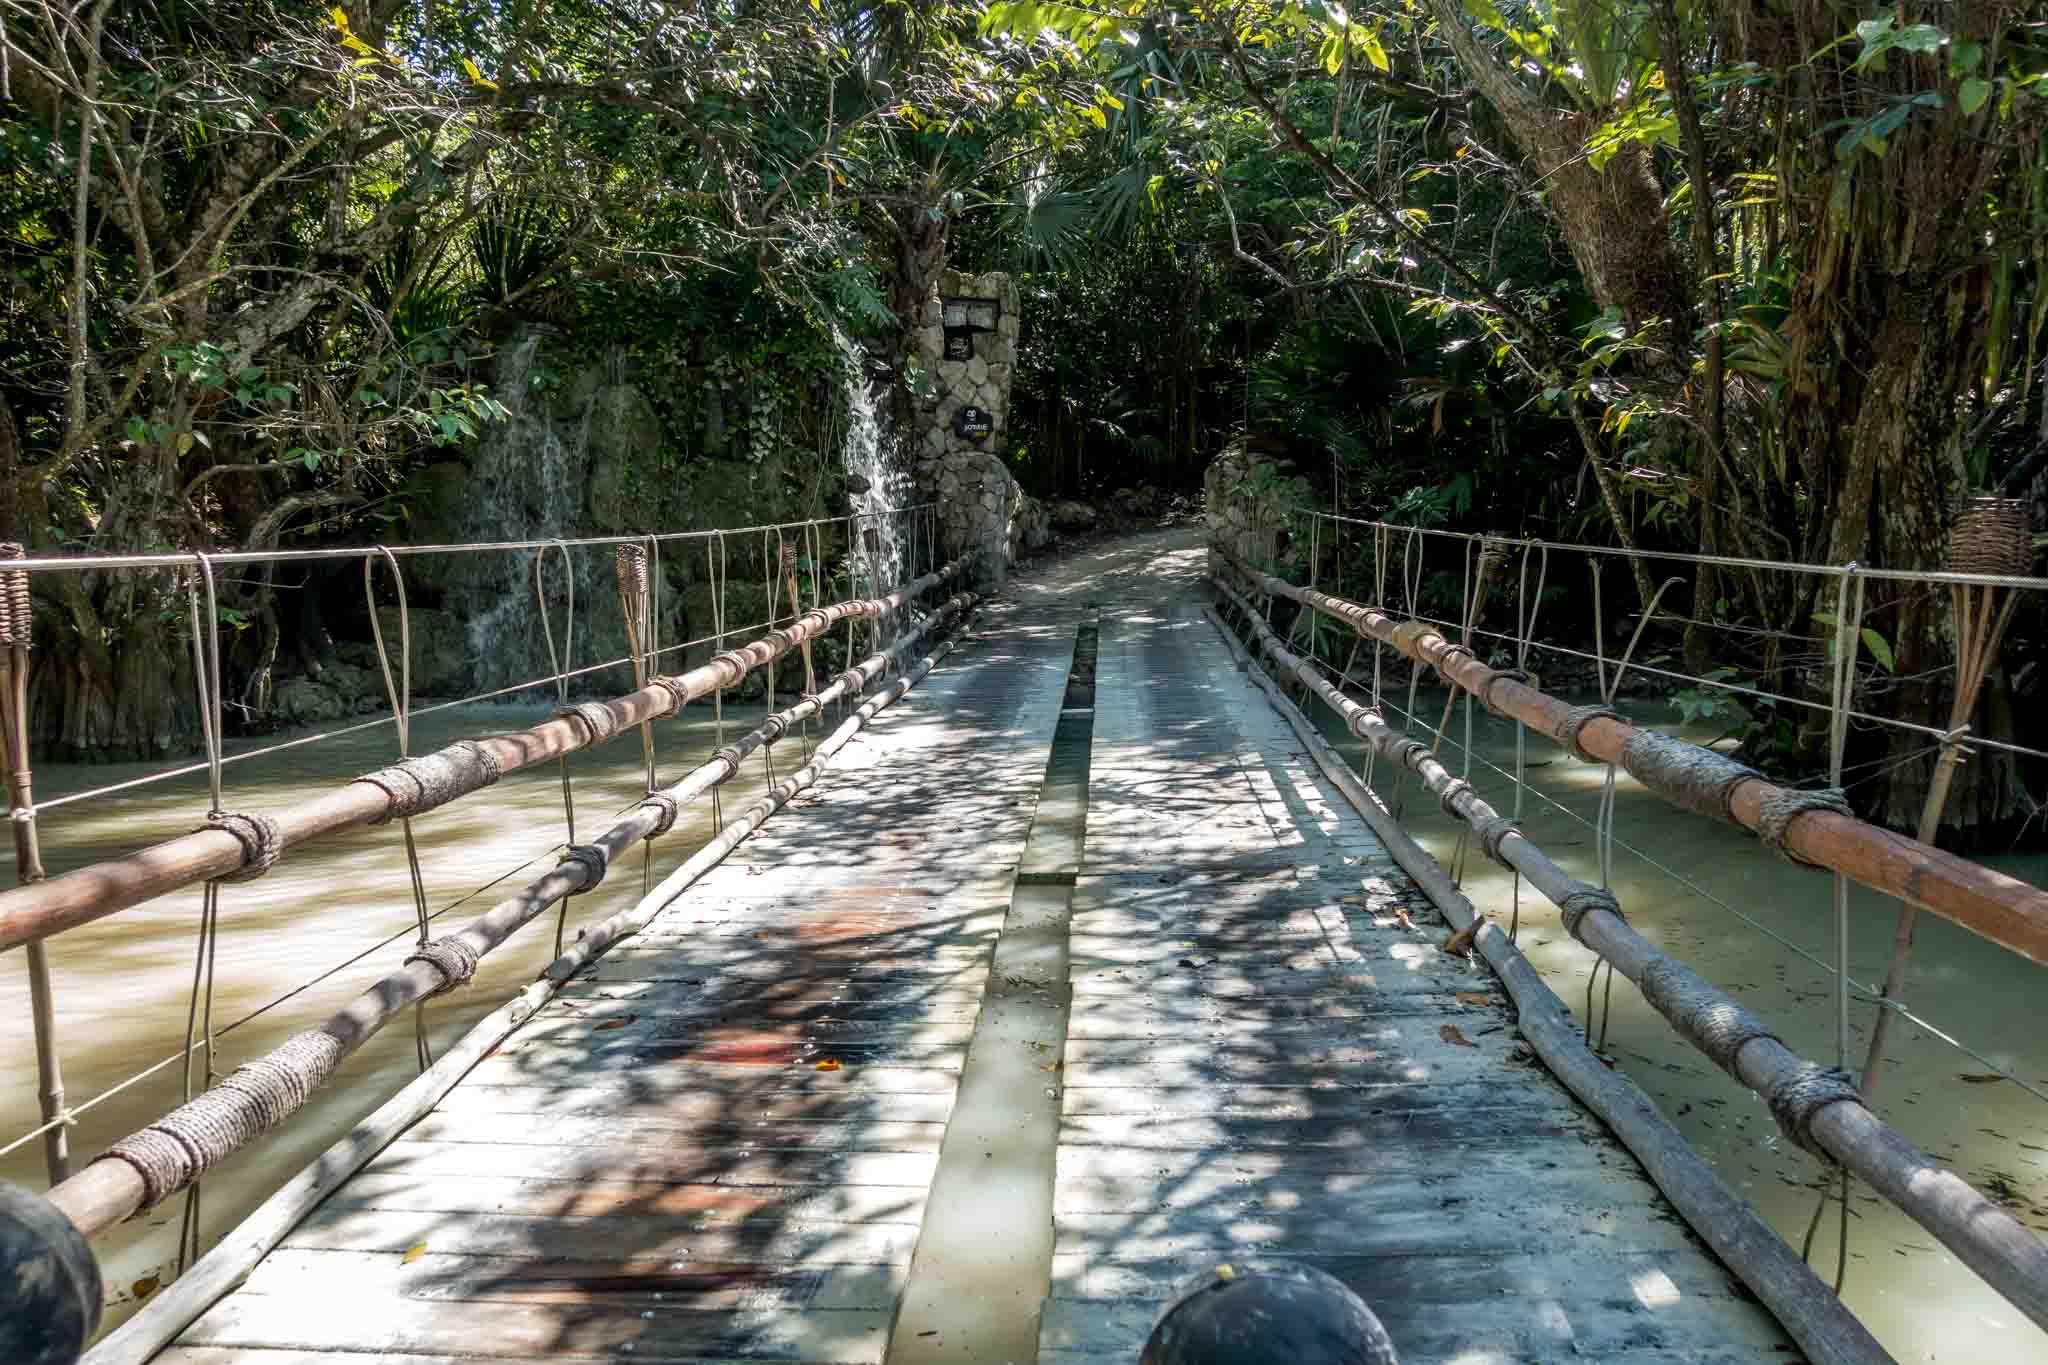 Bridge across very high water